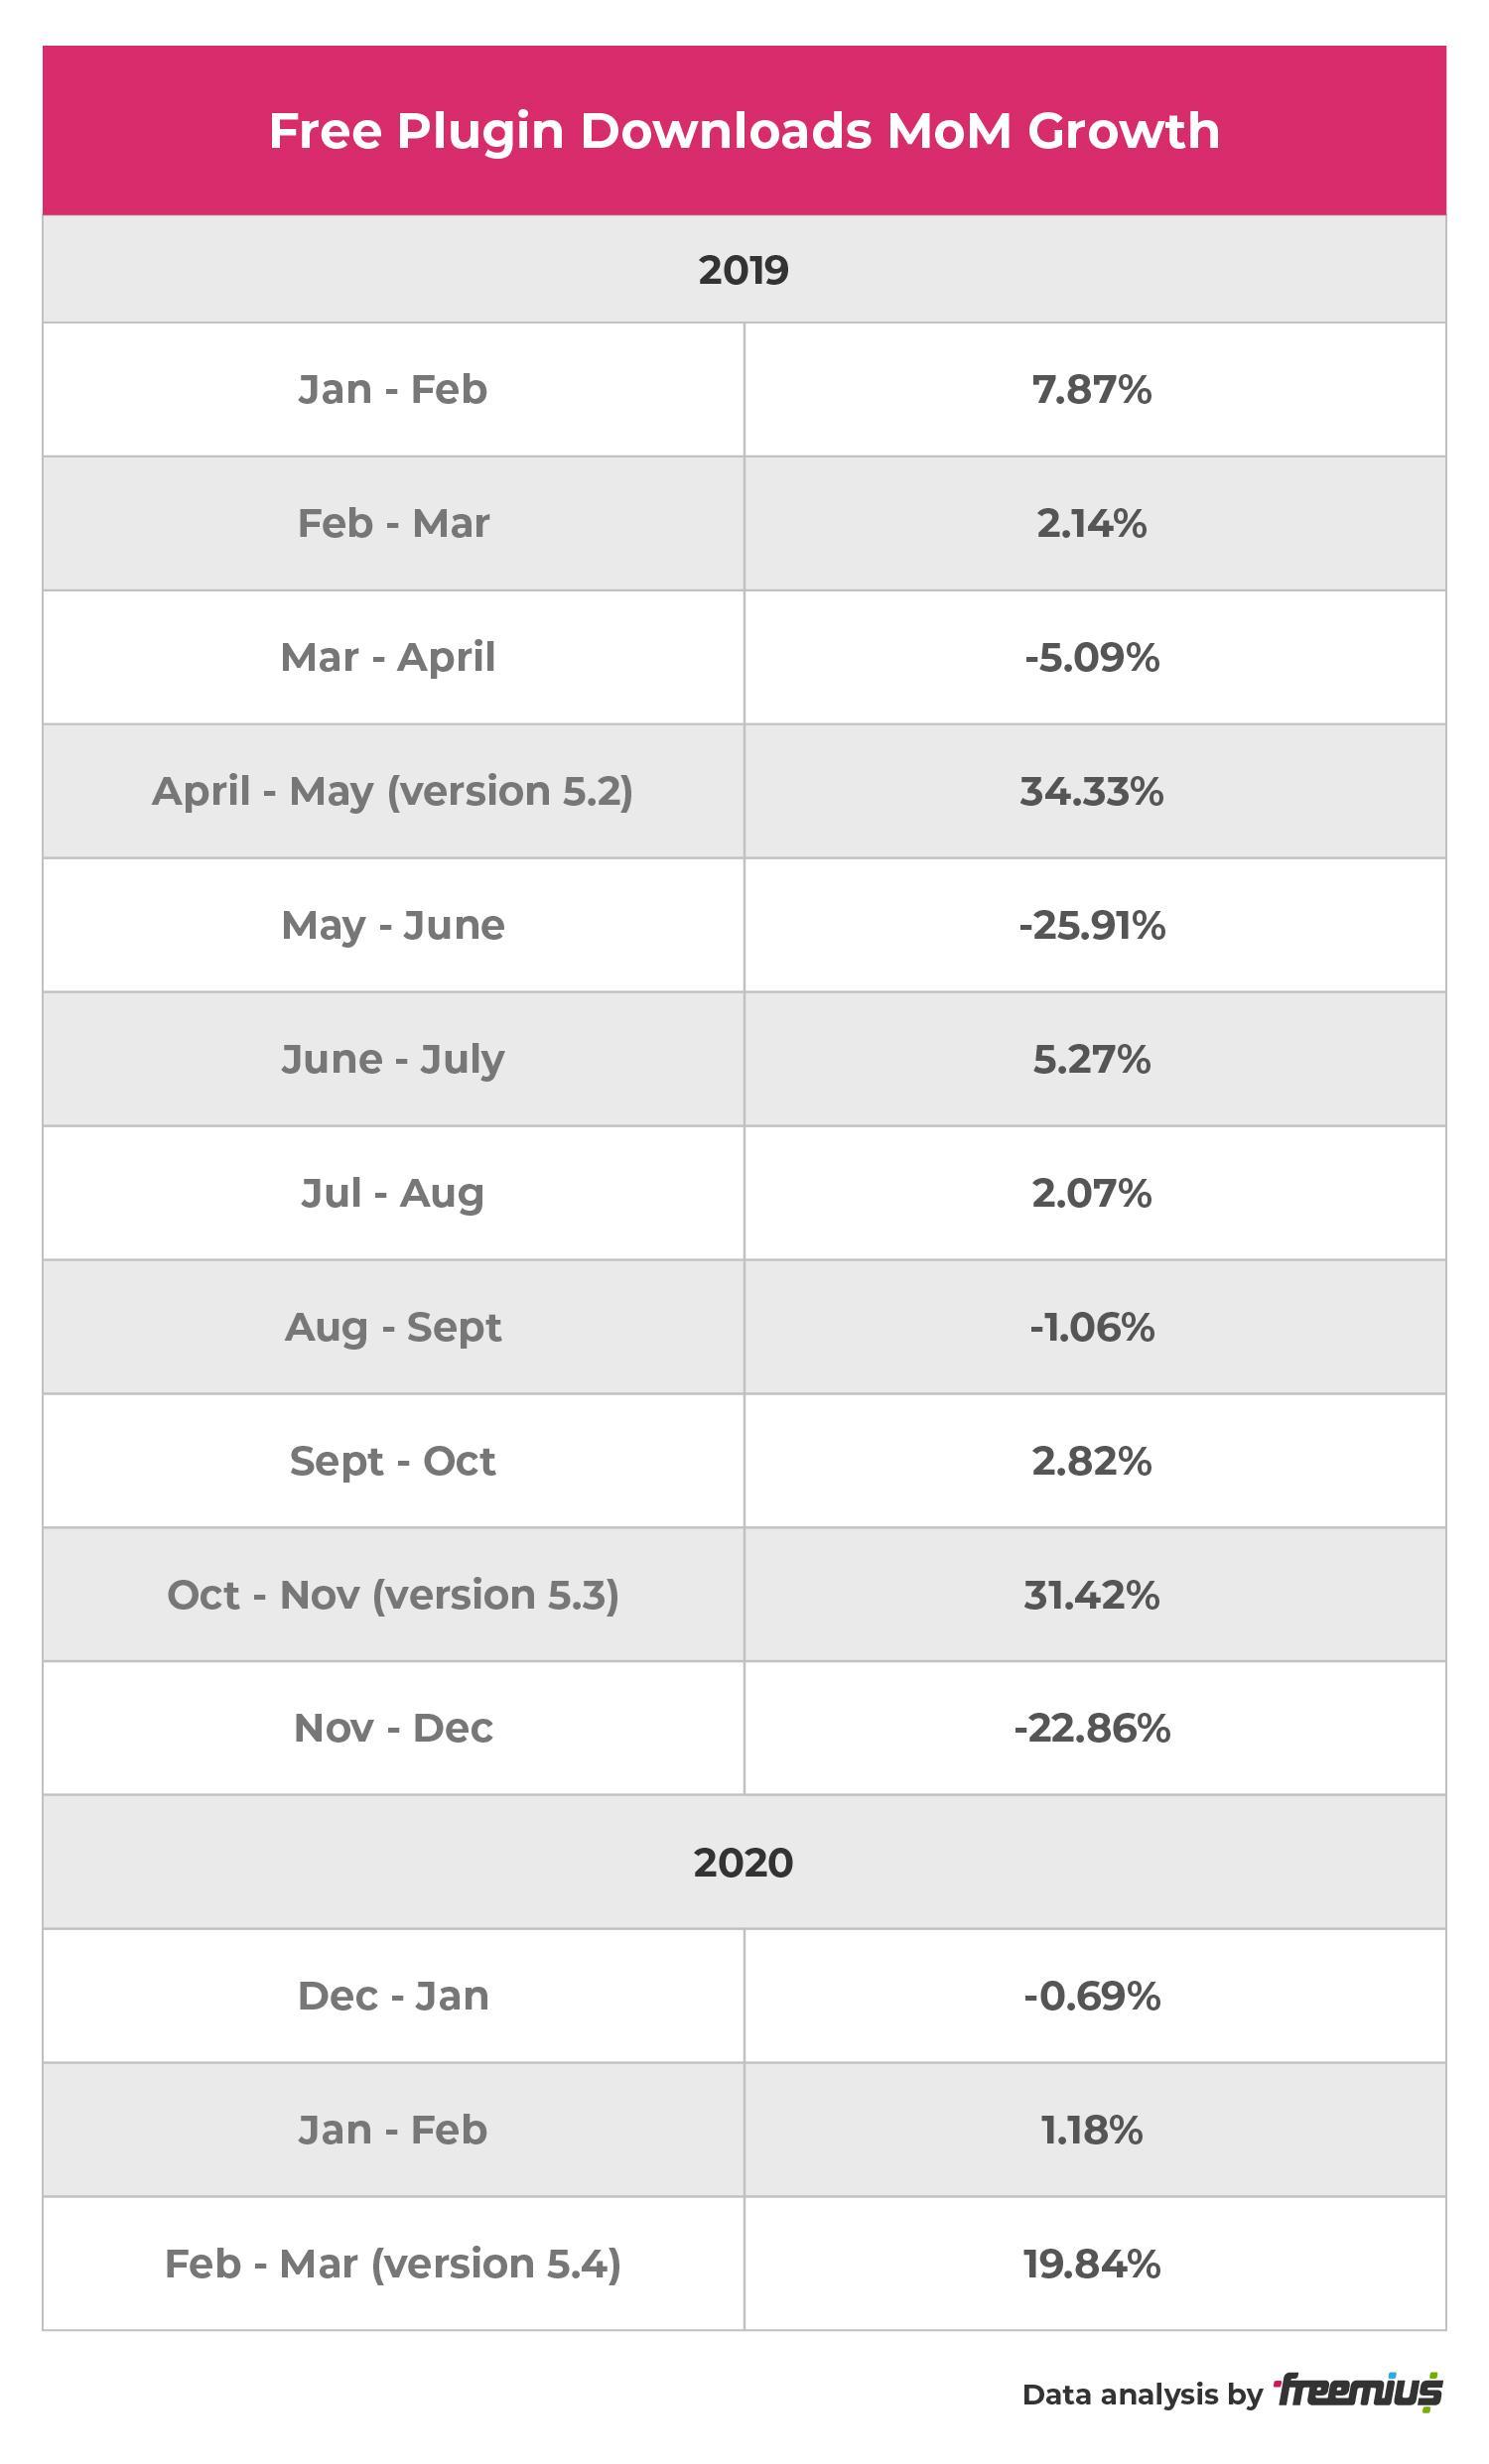 Freemius data analysis - Free Plugin Downloads MoM Growth